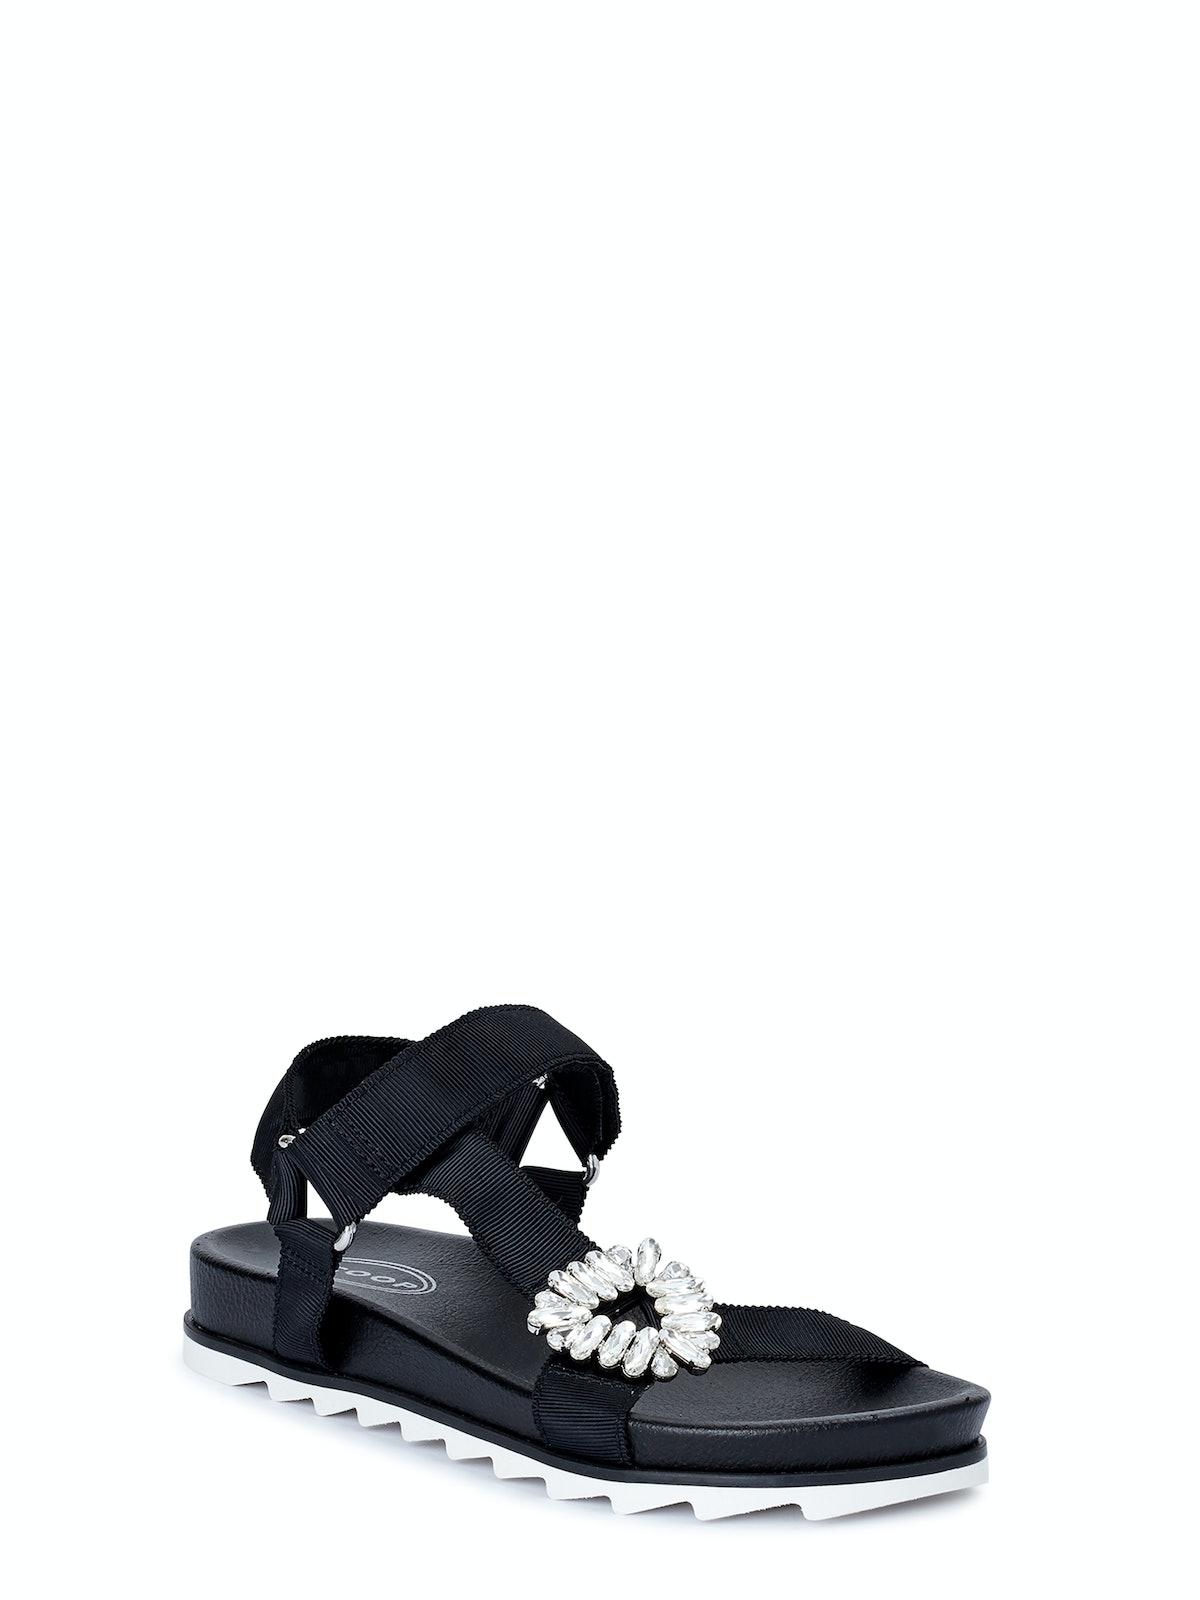 Rhinestone Embellished Sport Sandal